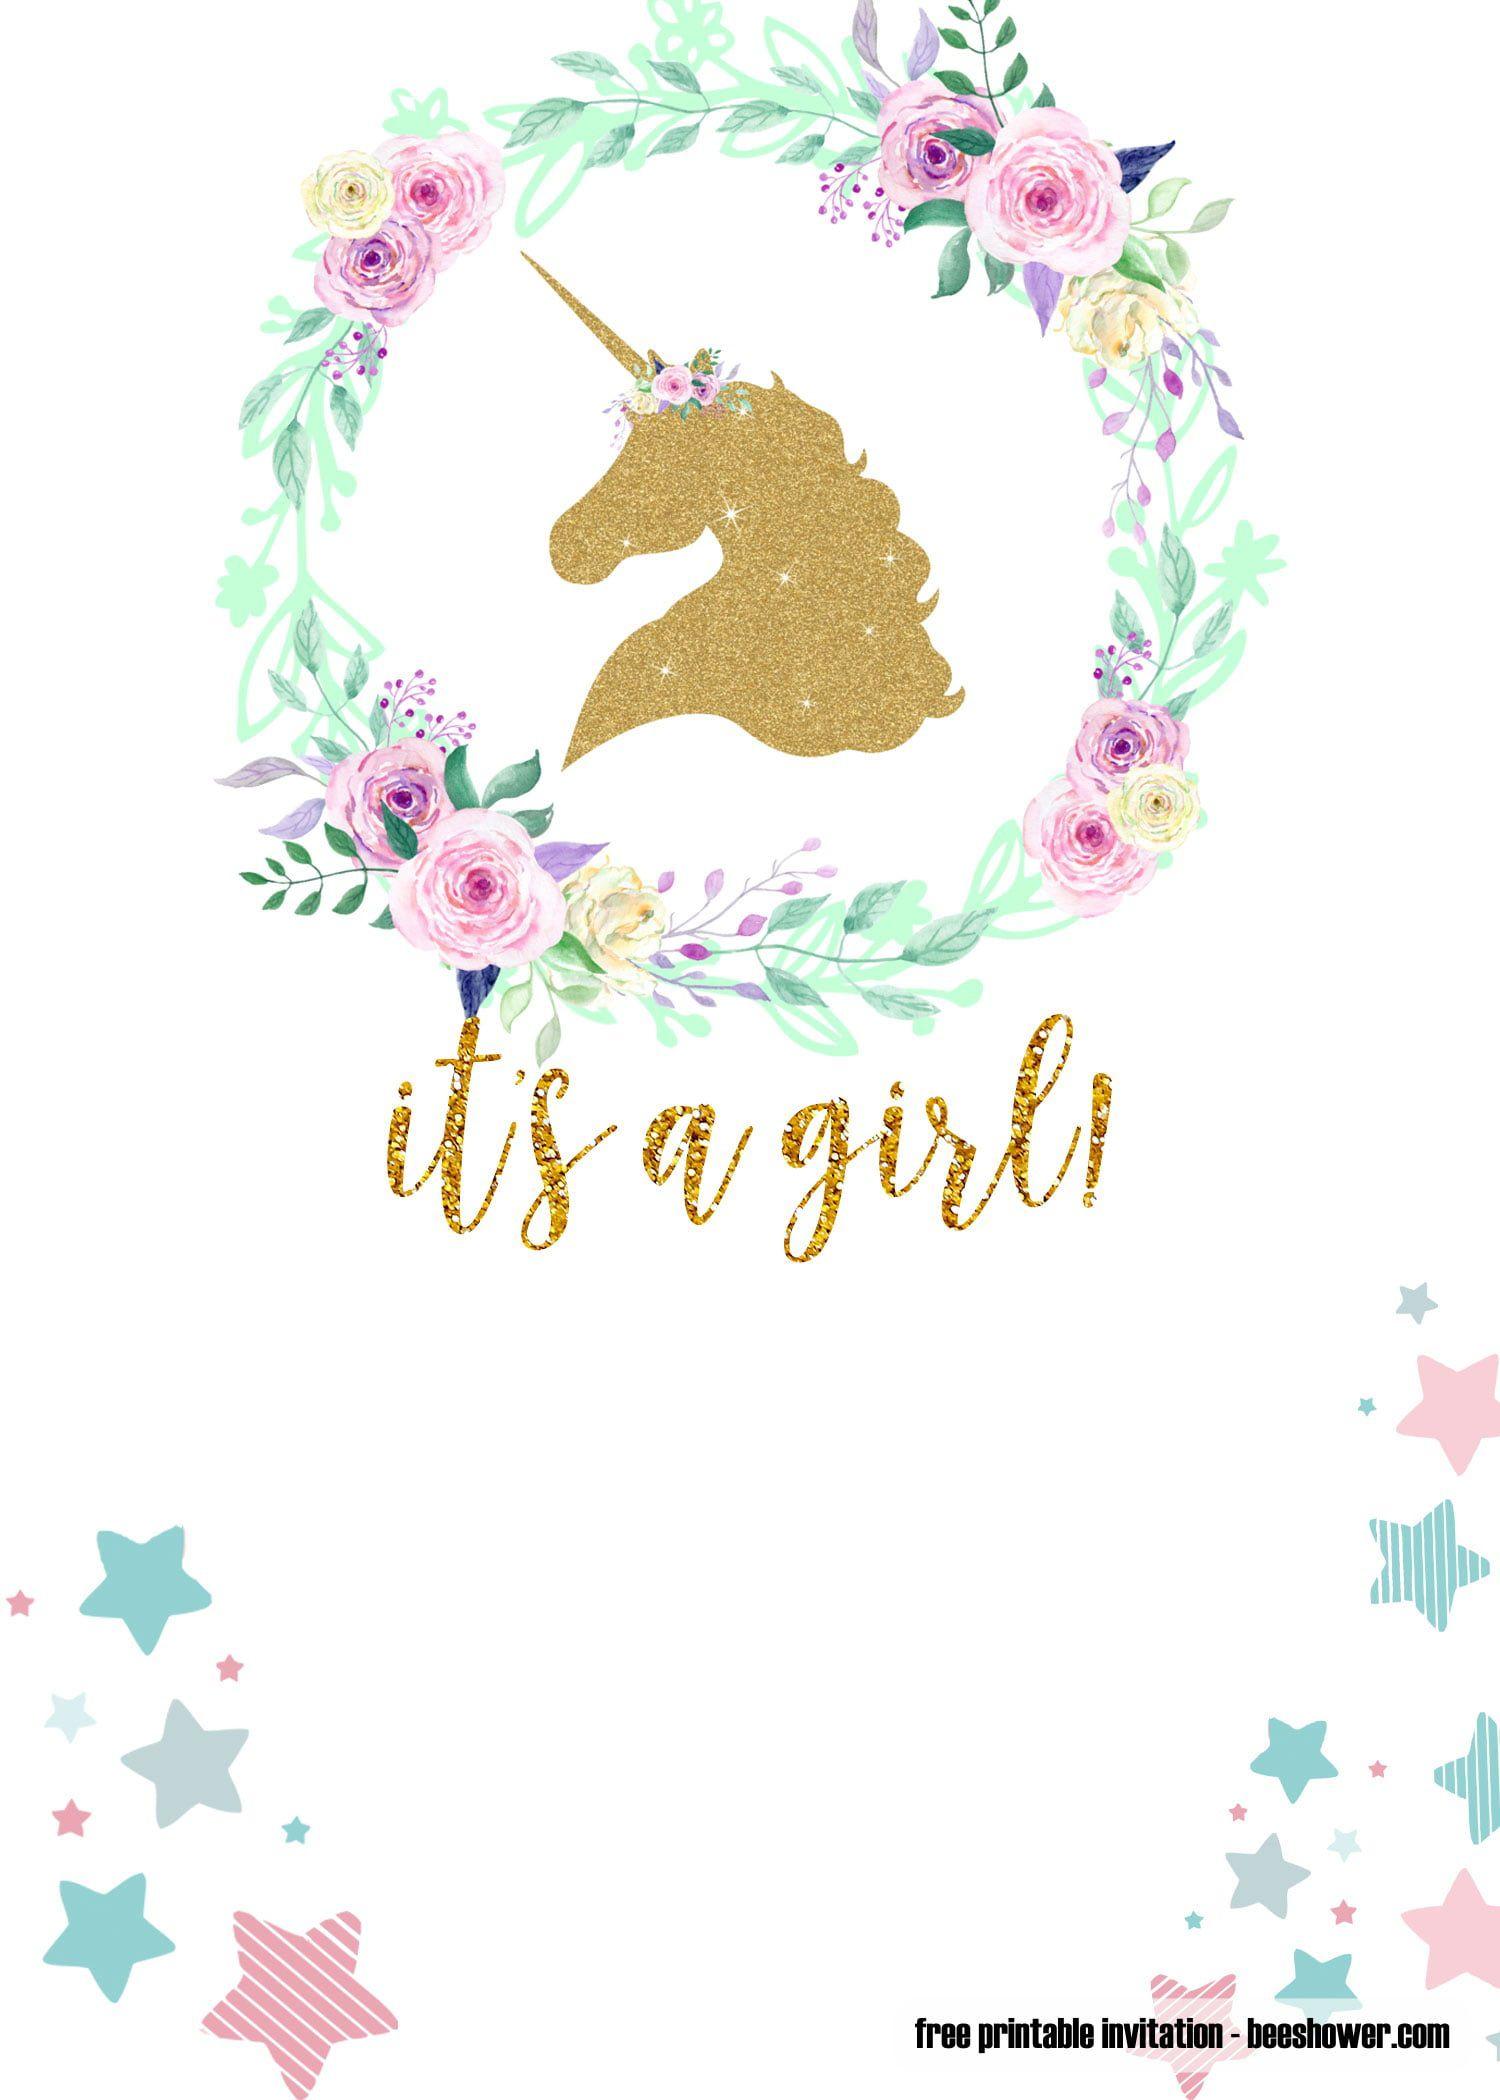 010 Unusual Unicorn Baby Shower Template Free Download Photo  Printable InvitationFull